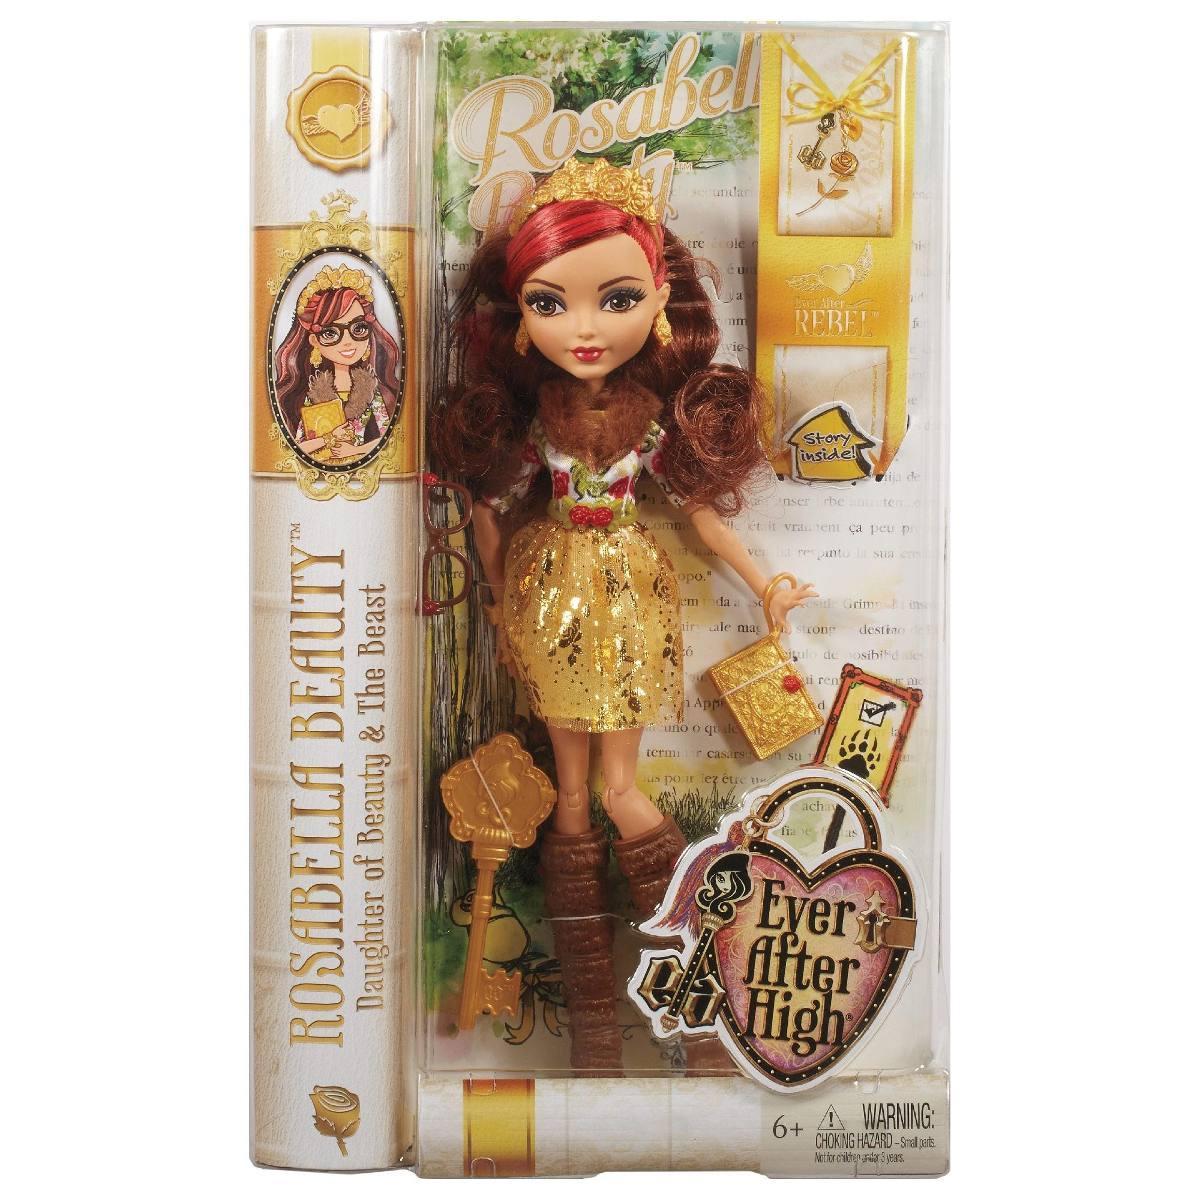 Лялька Евер Афтер Хай Розабелла Б'юті Rosabella Beauty Ever After High 1 хвиля лялька евер Розабела